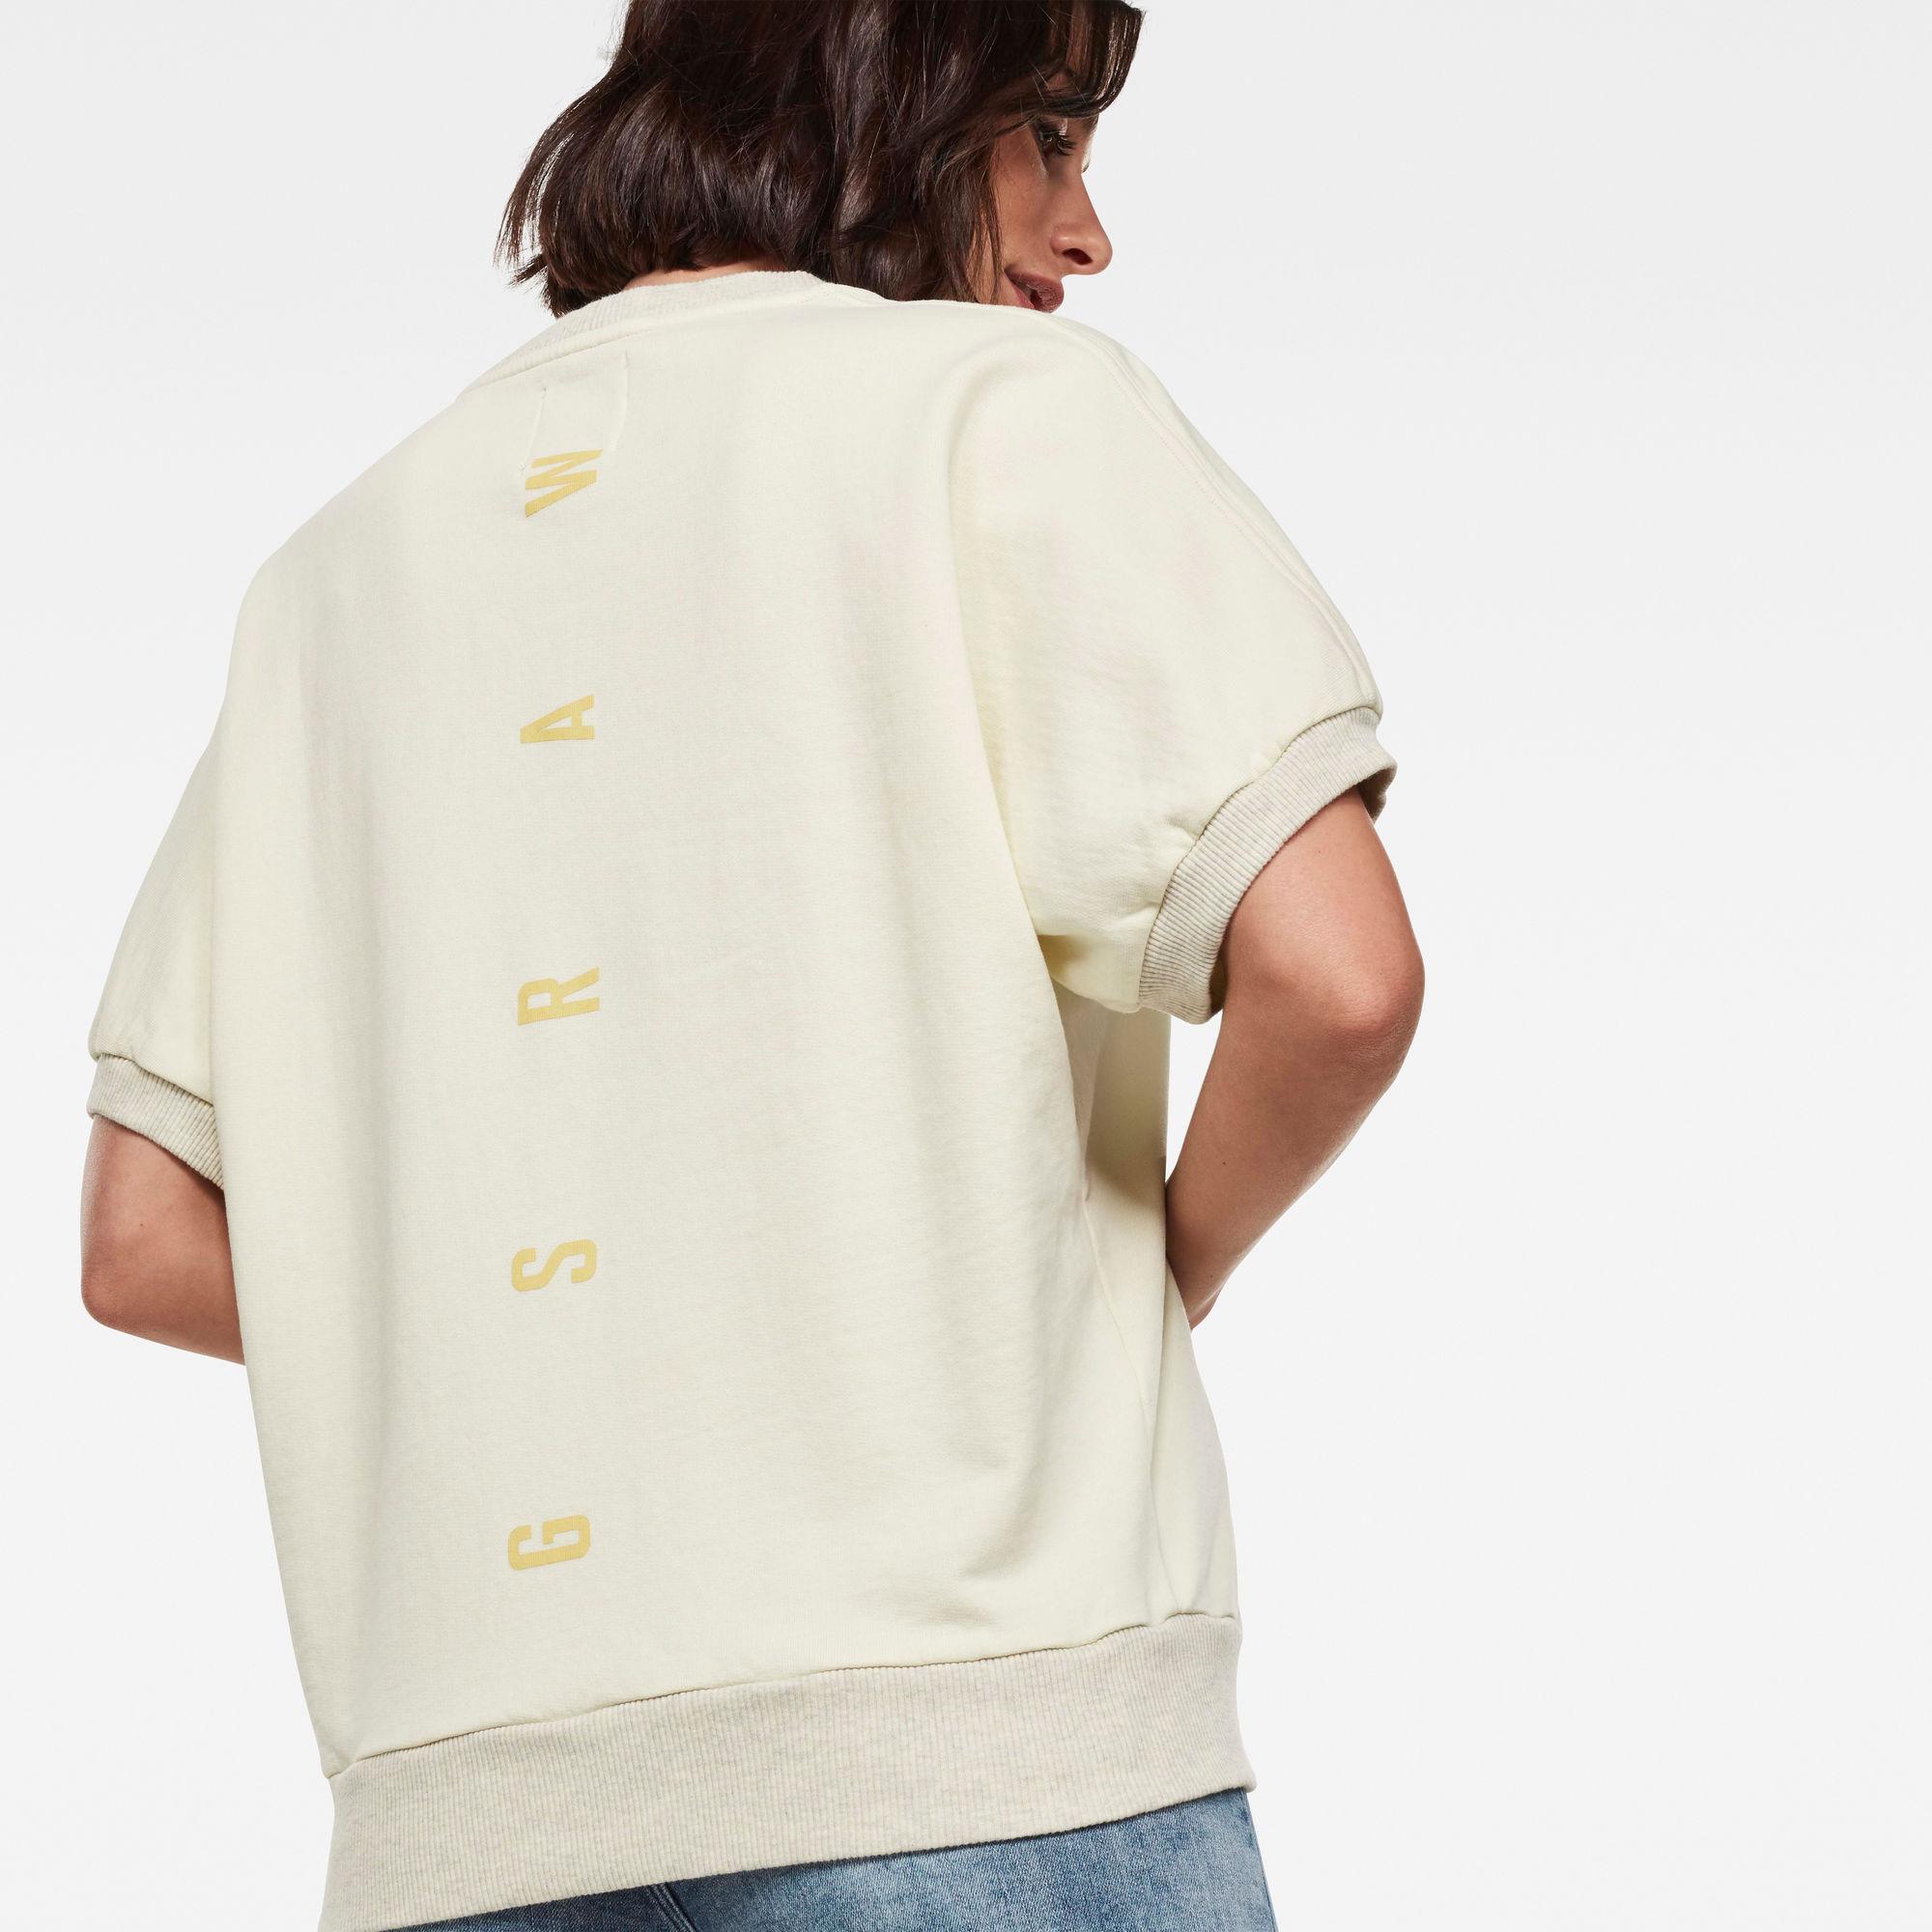 G Star RAW Jasmar Sweater